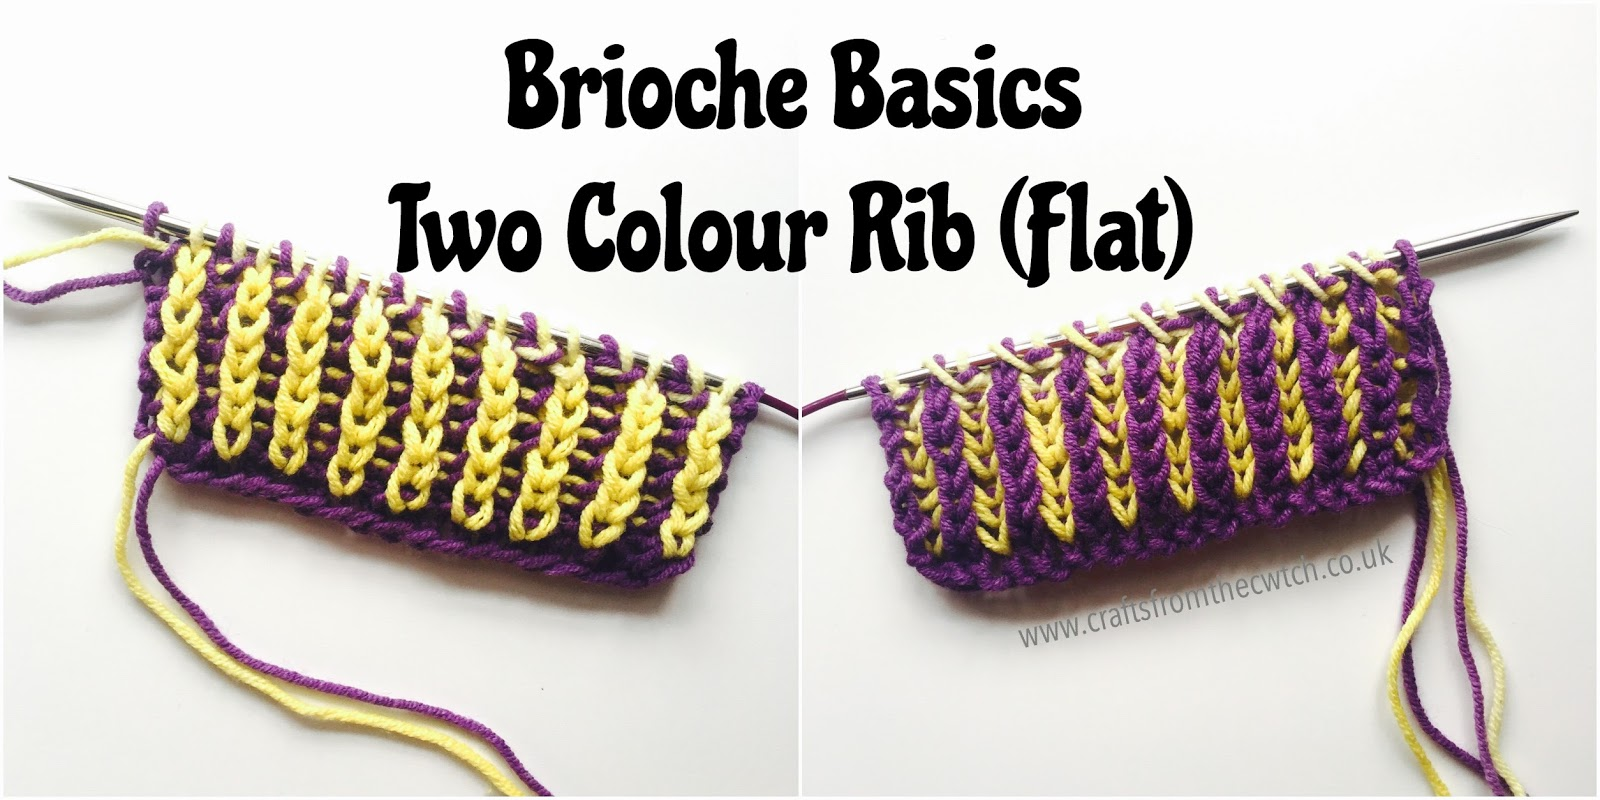 Brioche Knitting Part 4 Two Colour Brioche Rib Knit Flat Crafts